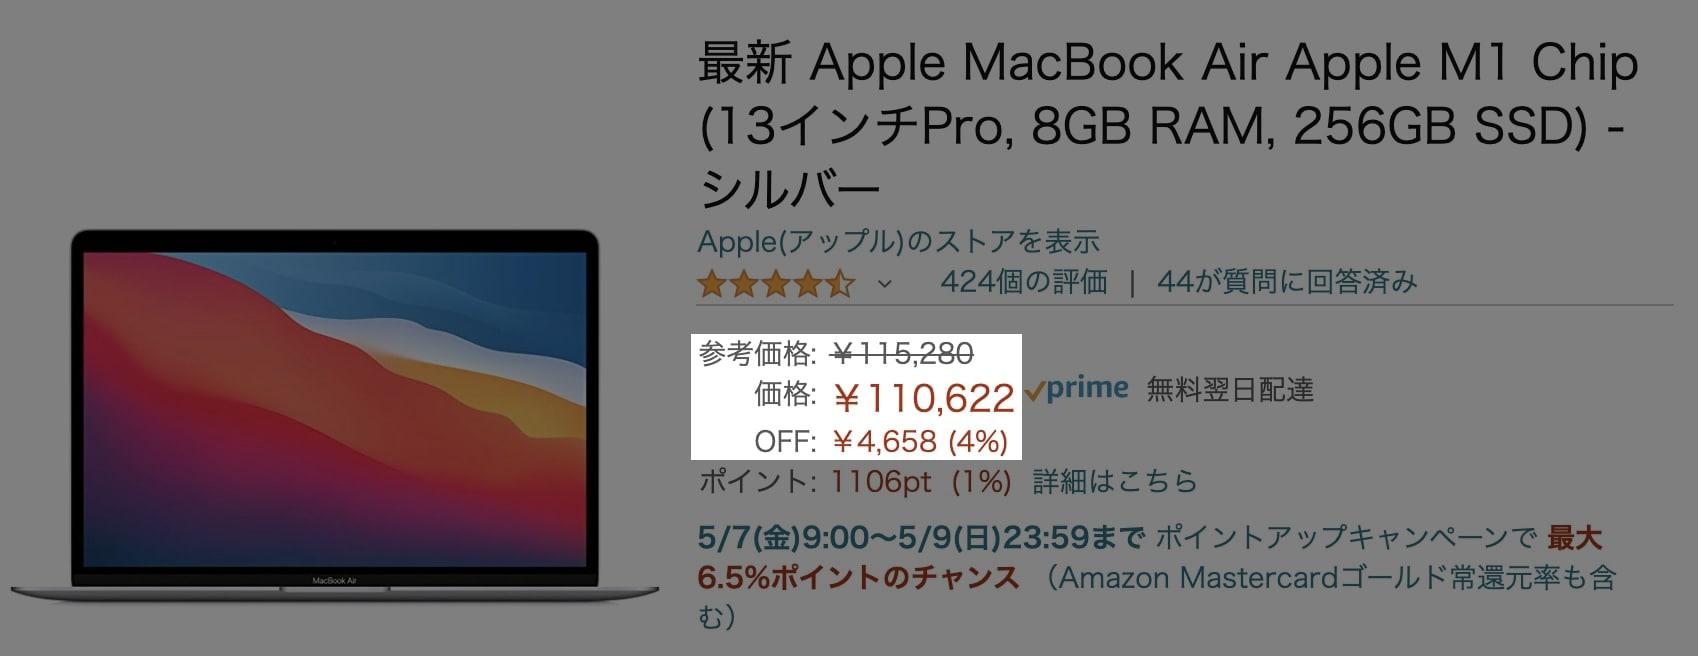 Amazonで販売されているMacBook Air